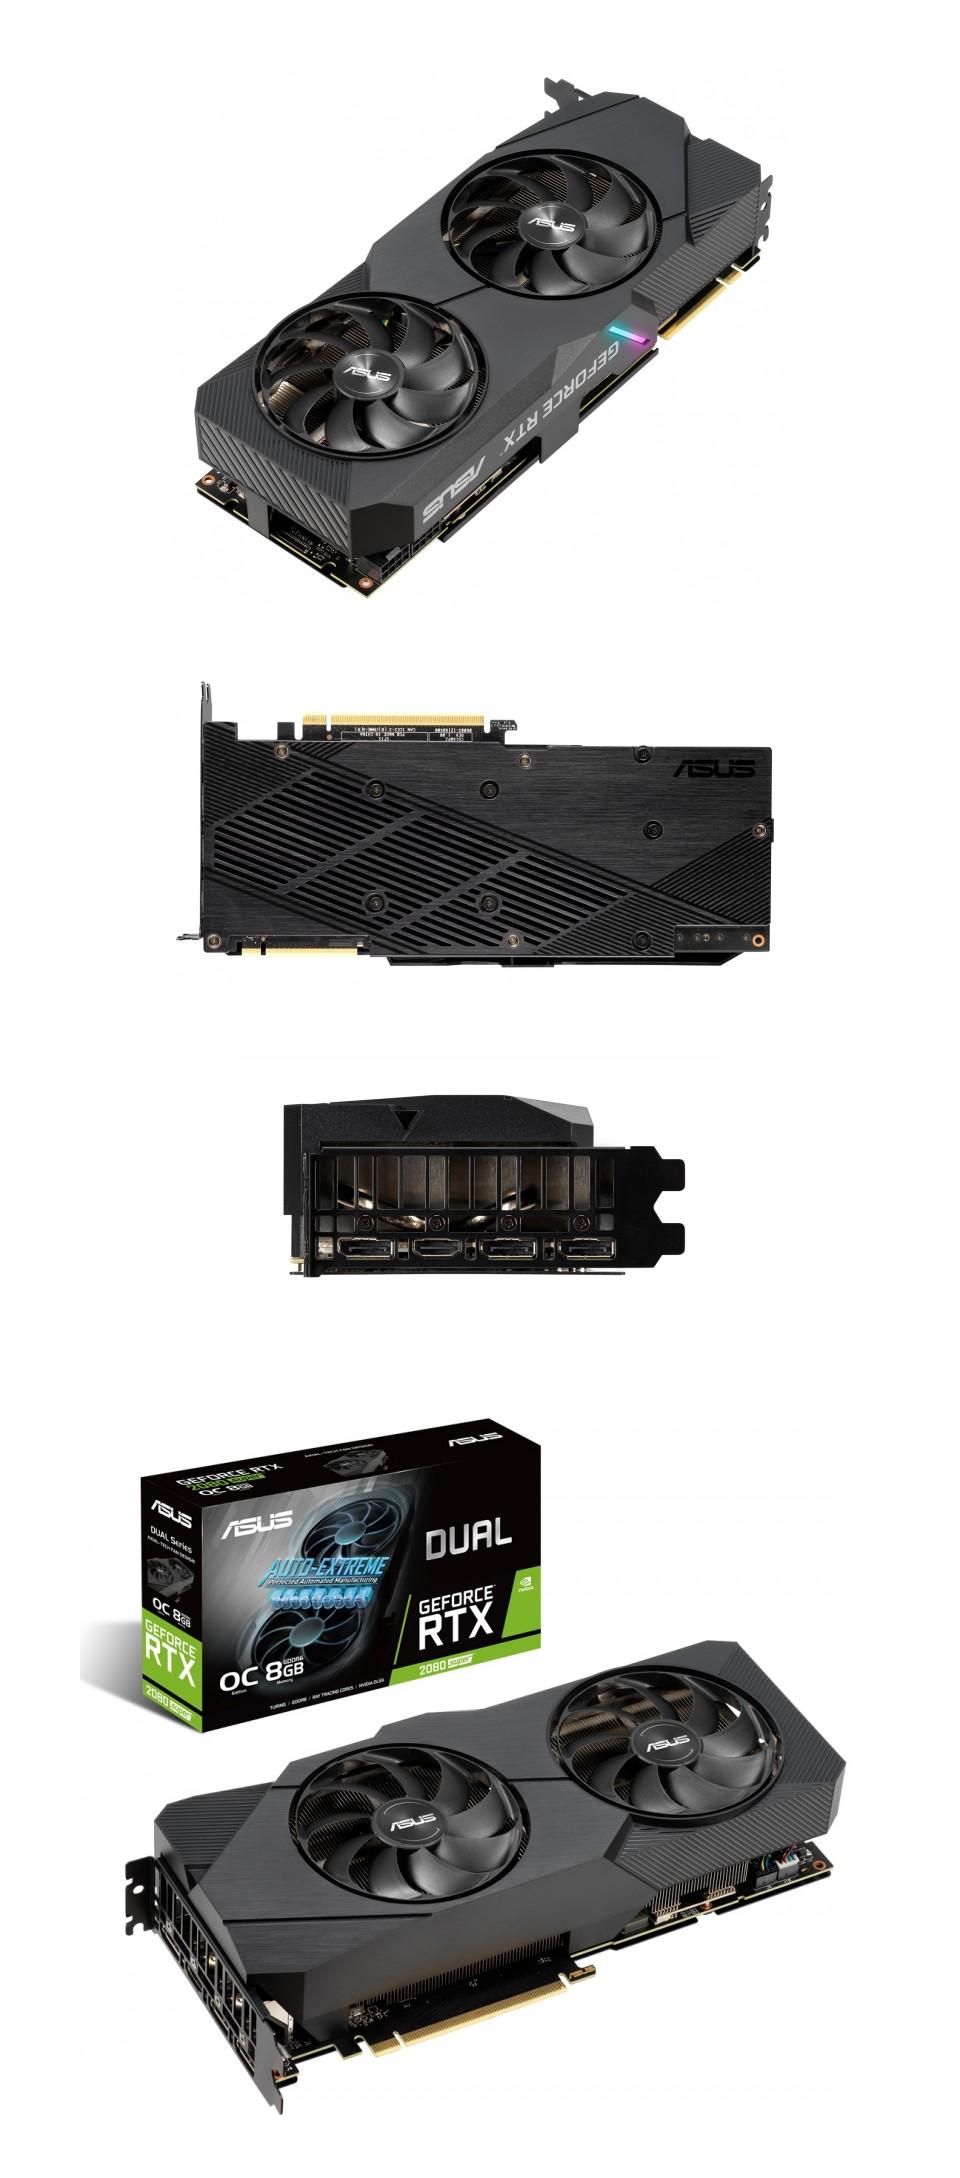 ASUS GeForce RTX 2080 Super Dual OC EVO 8GB V2 product